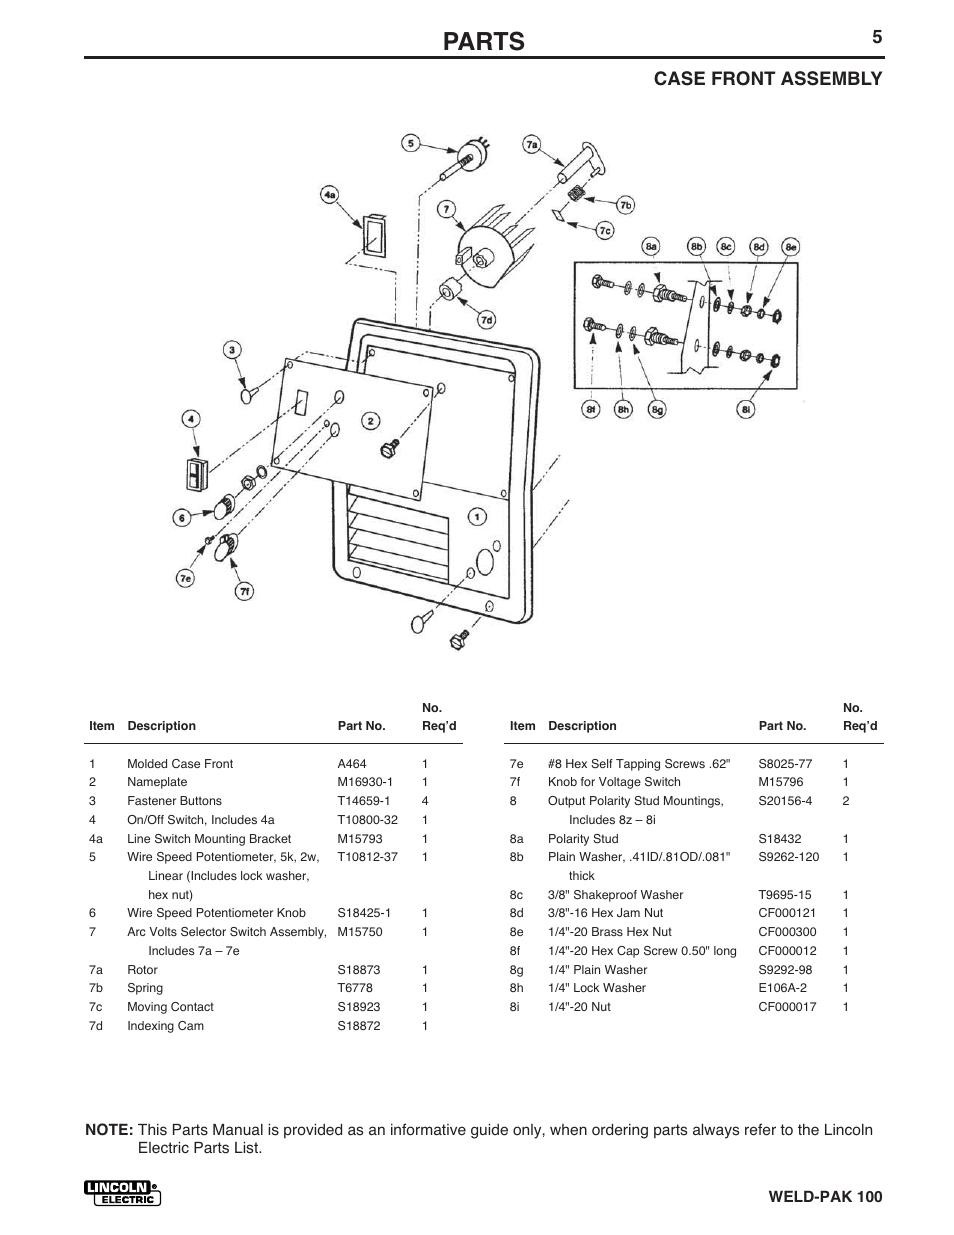 29 Lincoln Weld Pak 100 Parts Diagram